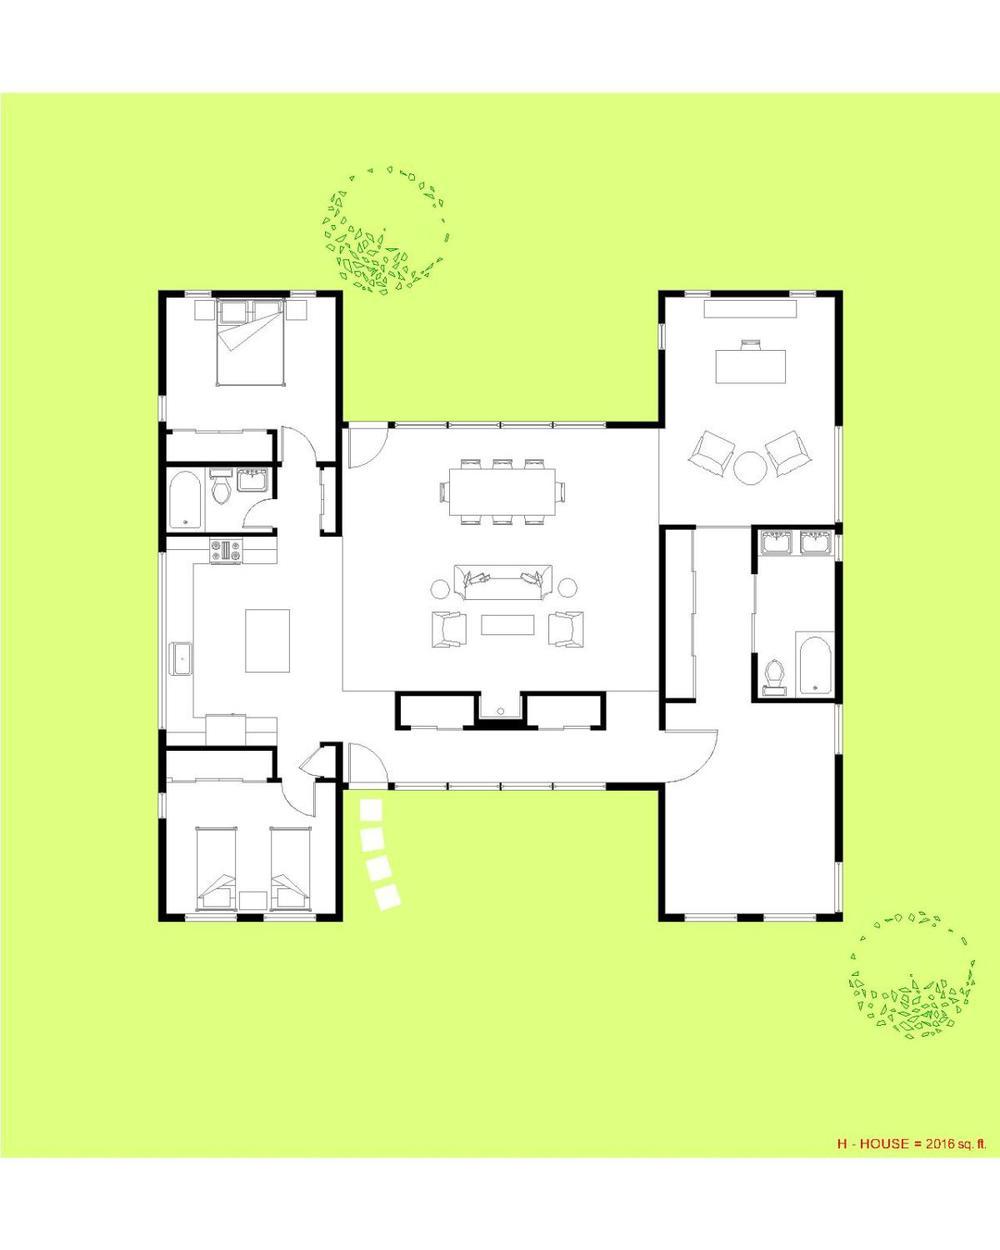 1 story modern house plans Modern House